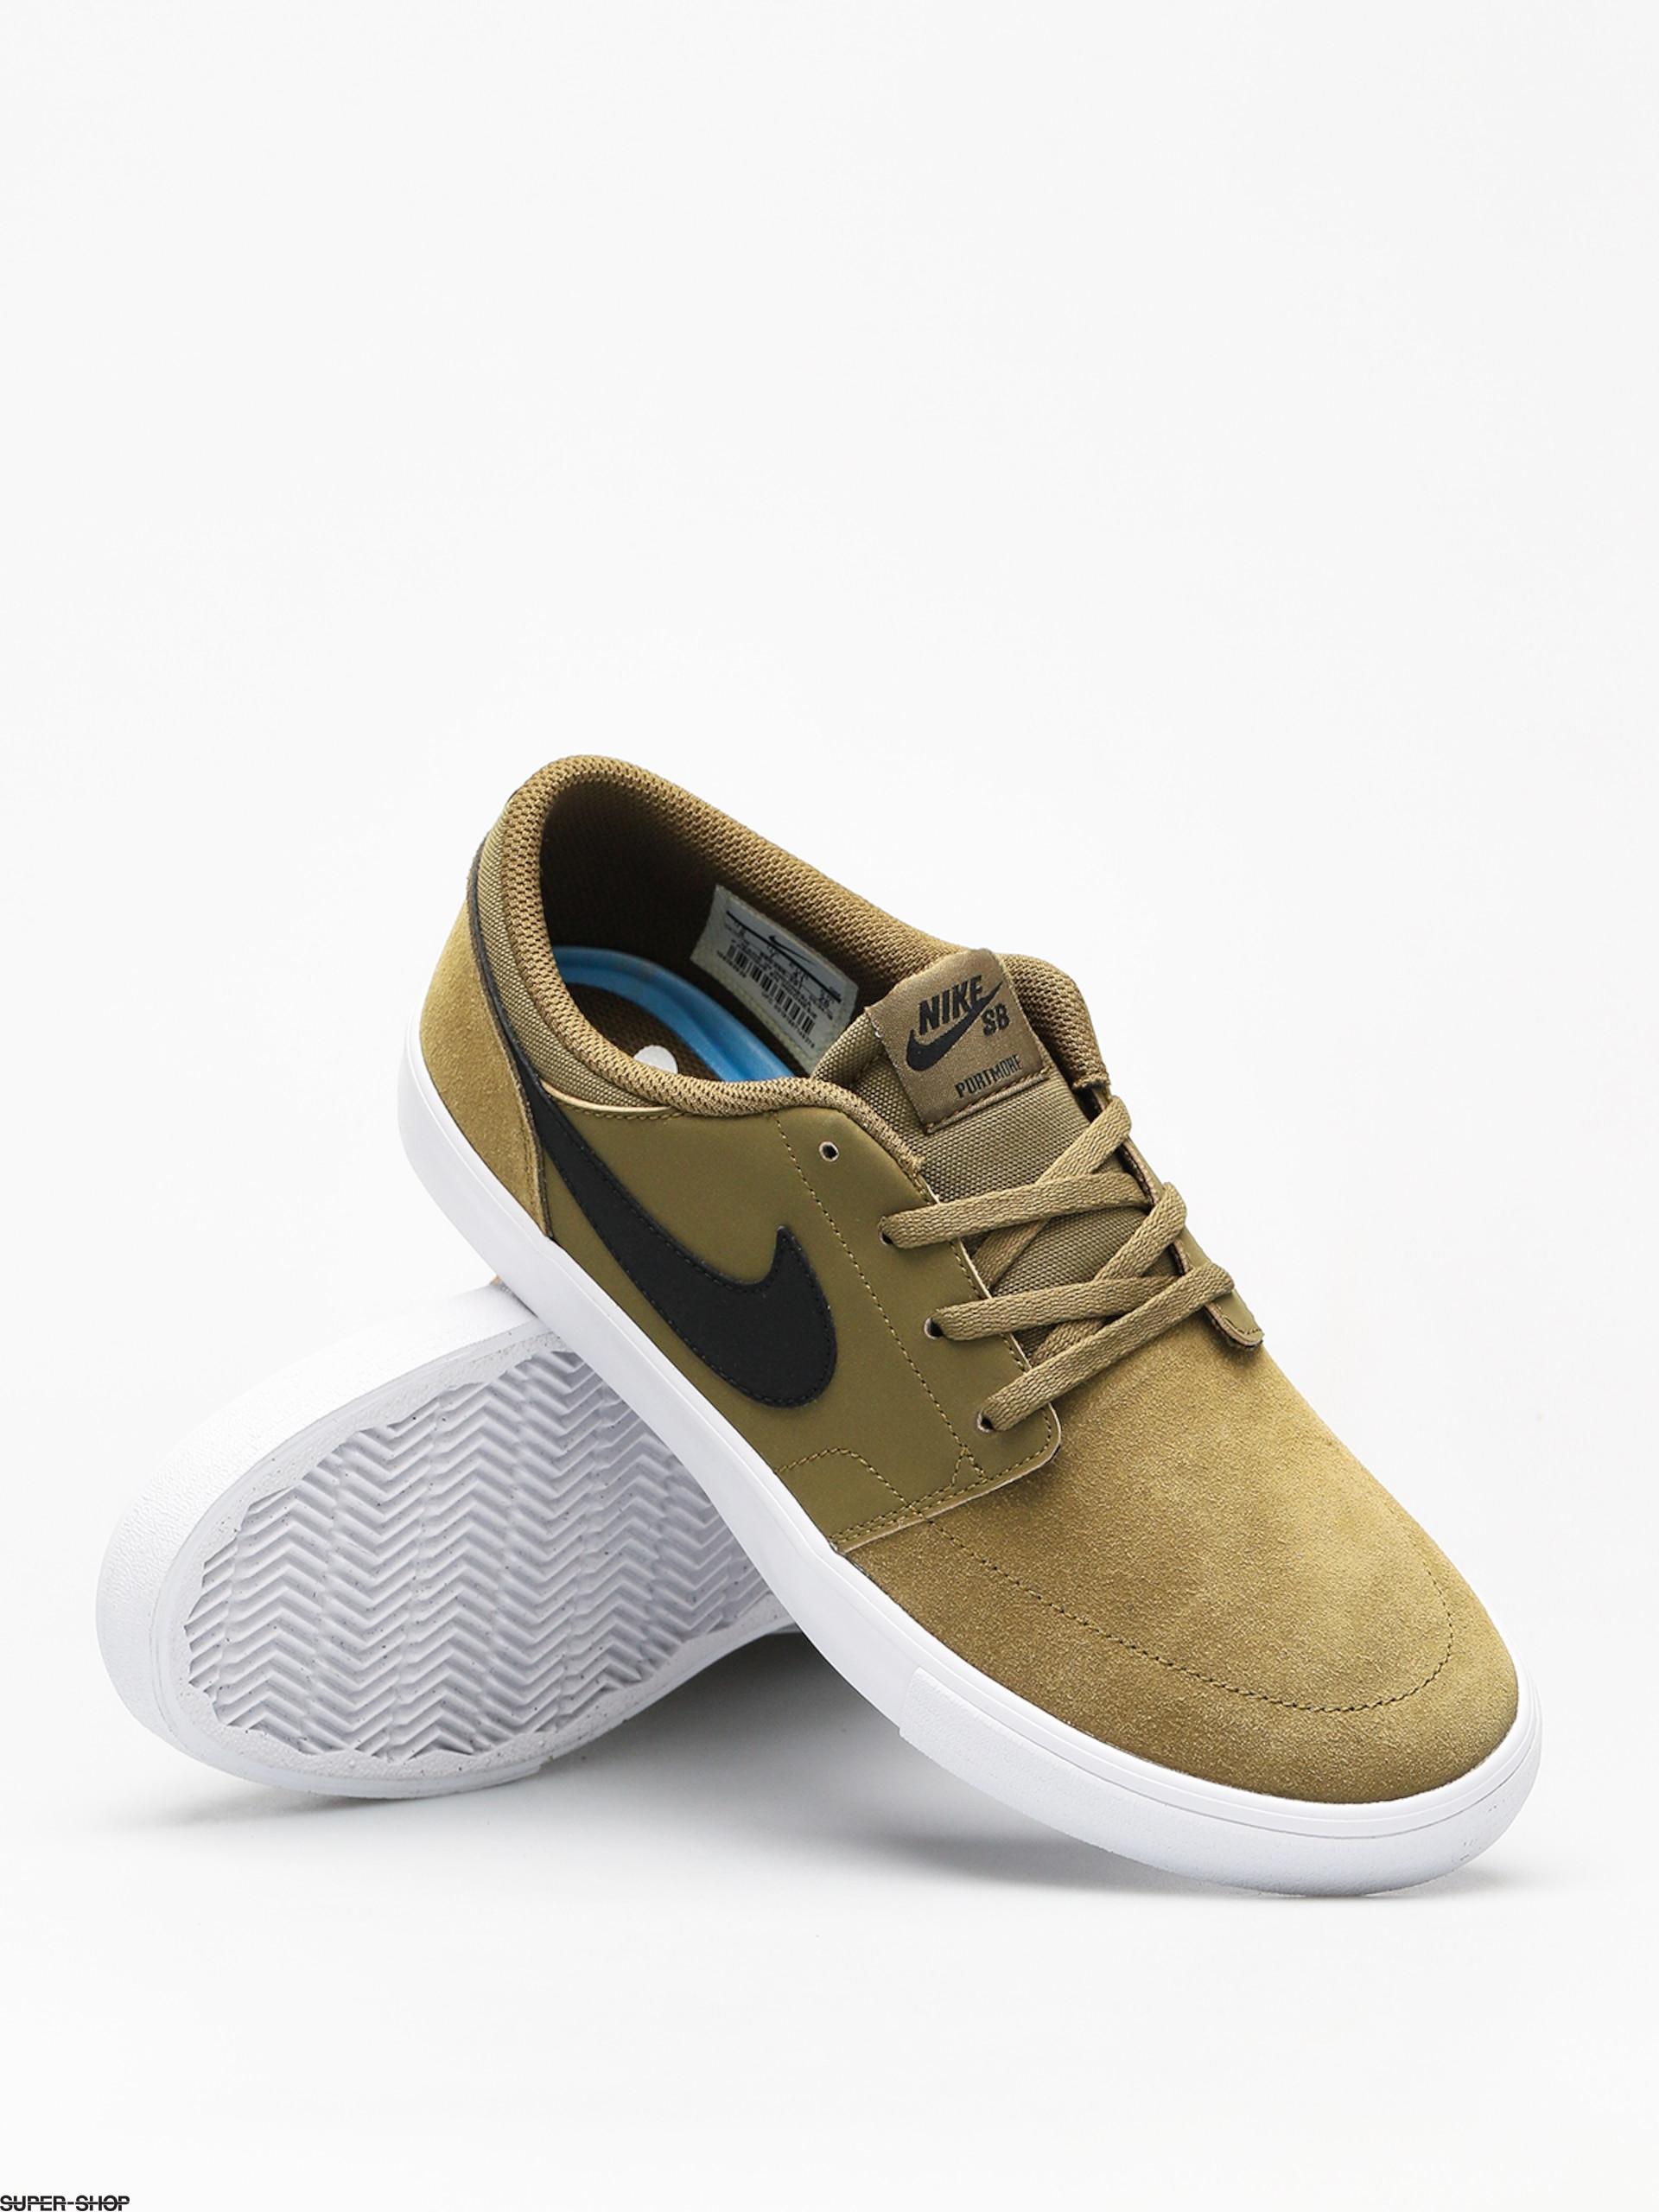 Shoes Black Sb Flakblack White Ii Portmore Nike Solarsoft Olive Tz8u8w 7gyb6Yfv